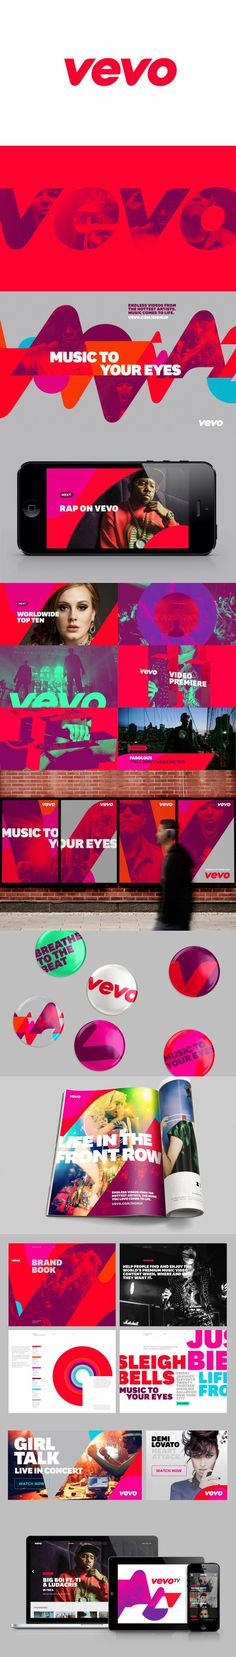 "Motion, color, duotone images, use of the letter ""V"" Brand Identity Design, Branding Design, Logo Design, Graphic Design, Branding Ideas, Corporate Branding, Corporate Design, Identity Branding, Web Design"